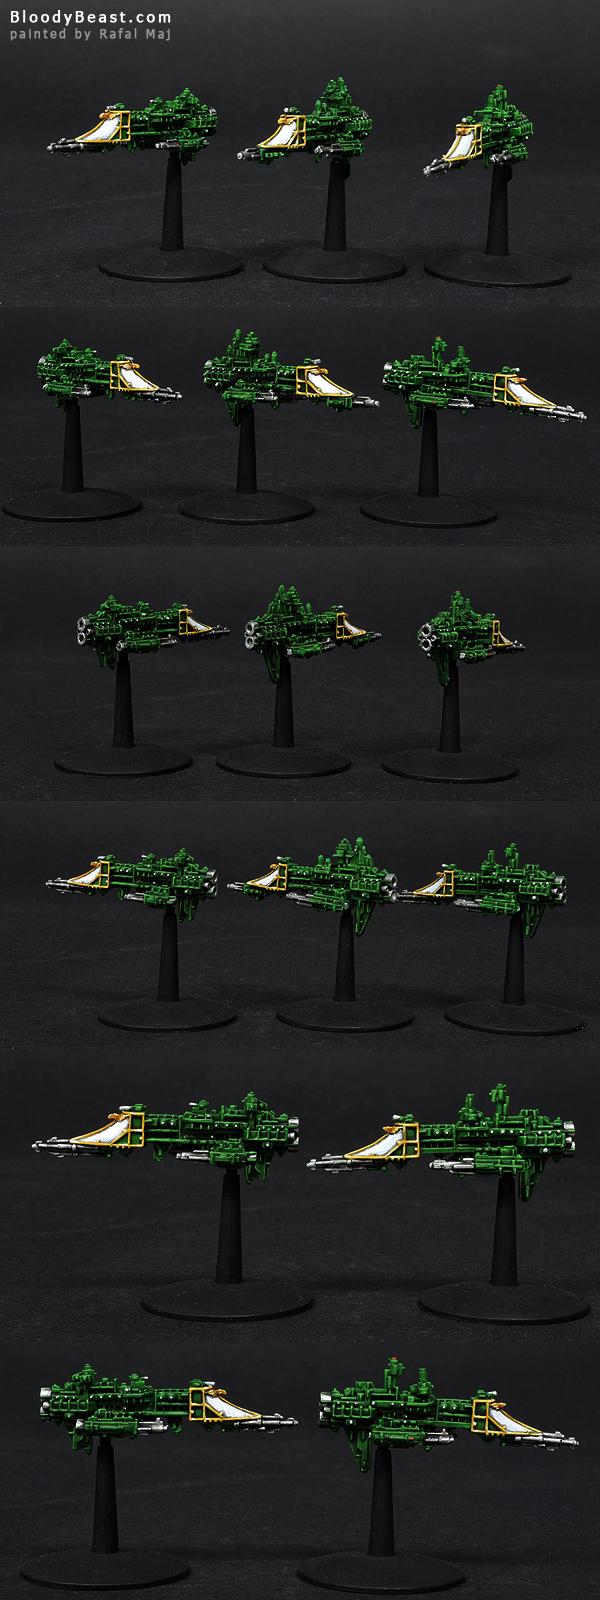 Imperial Firestorm Frigates painted by Rafal Maj (BloodyBeast.com)